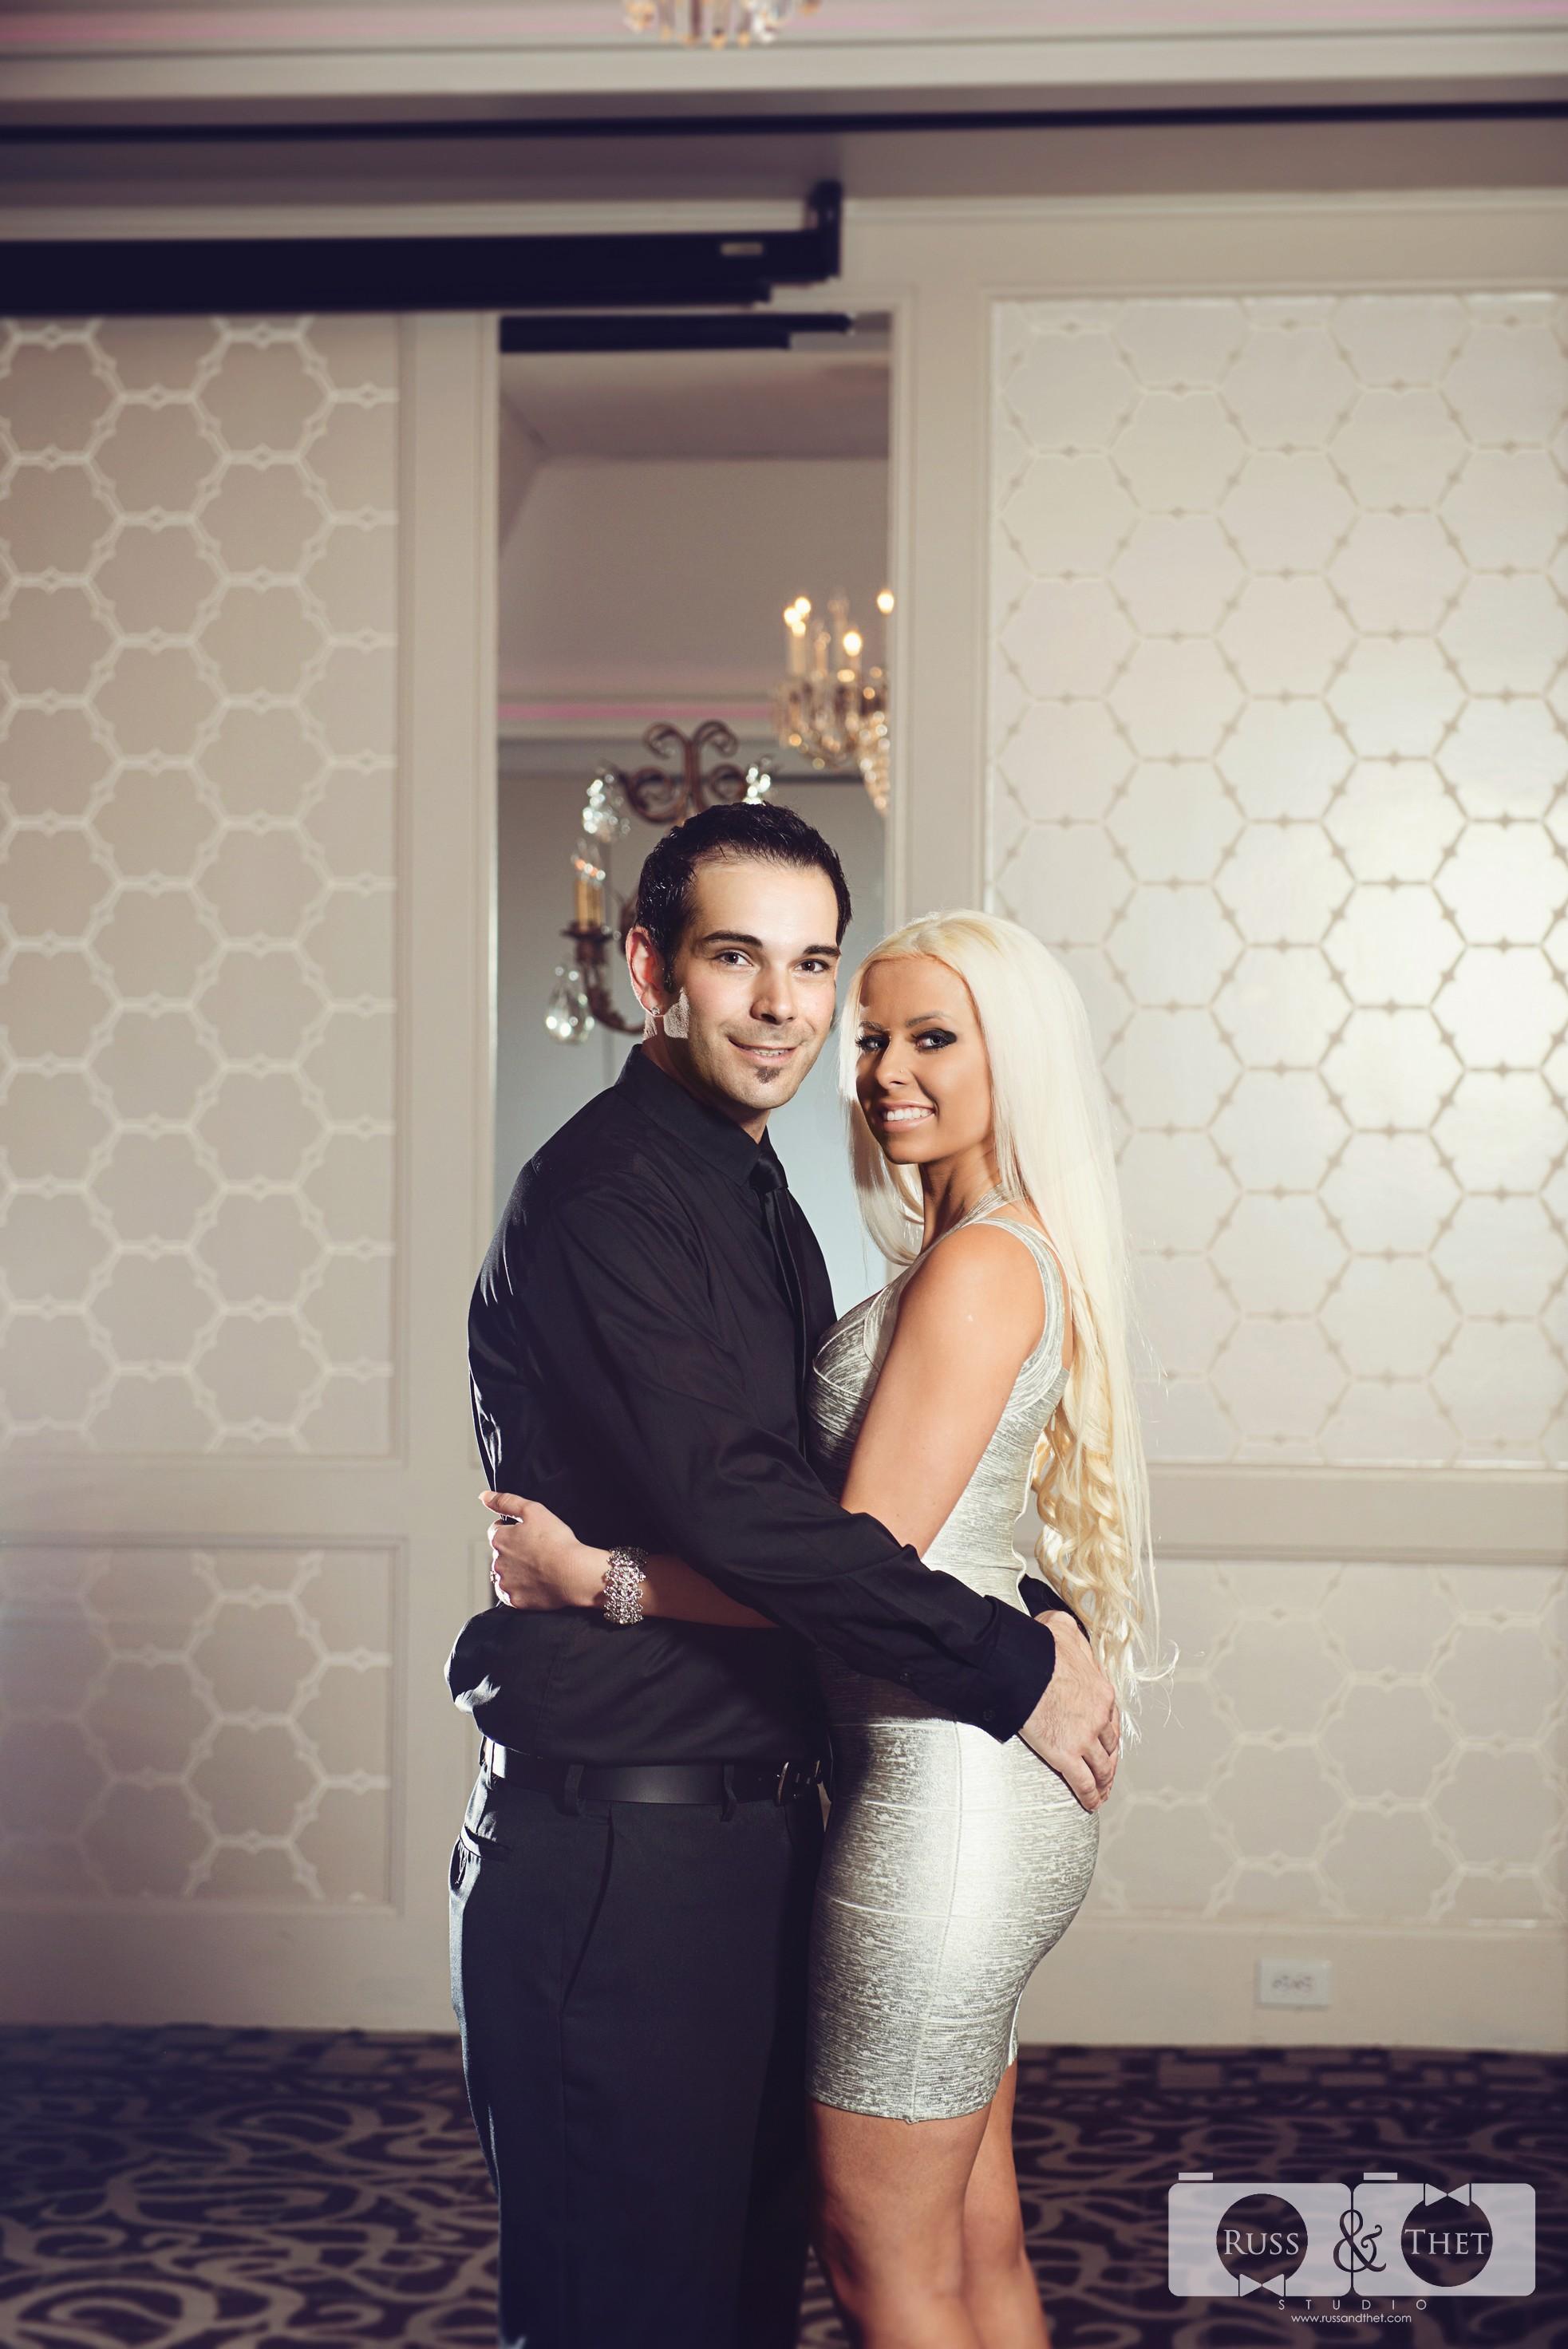 Jon&Kimee-The-Hills-Hotel-Engagement-Photographer (41).jpg